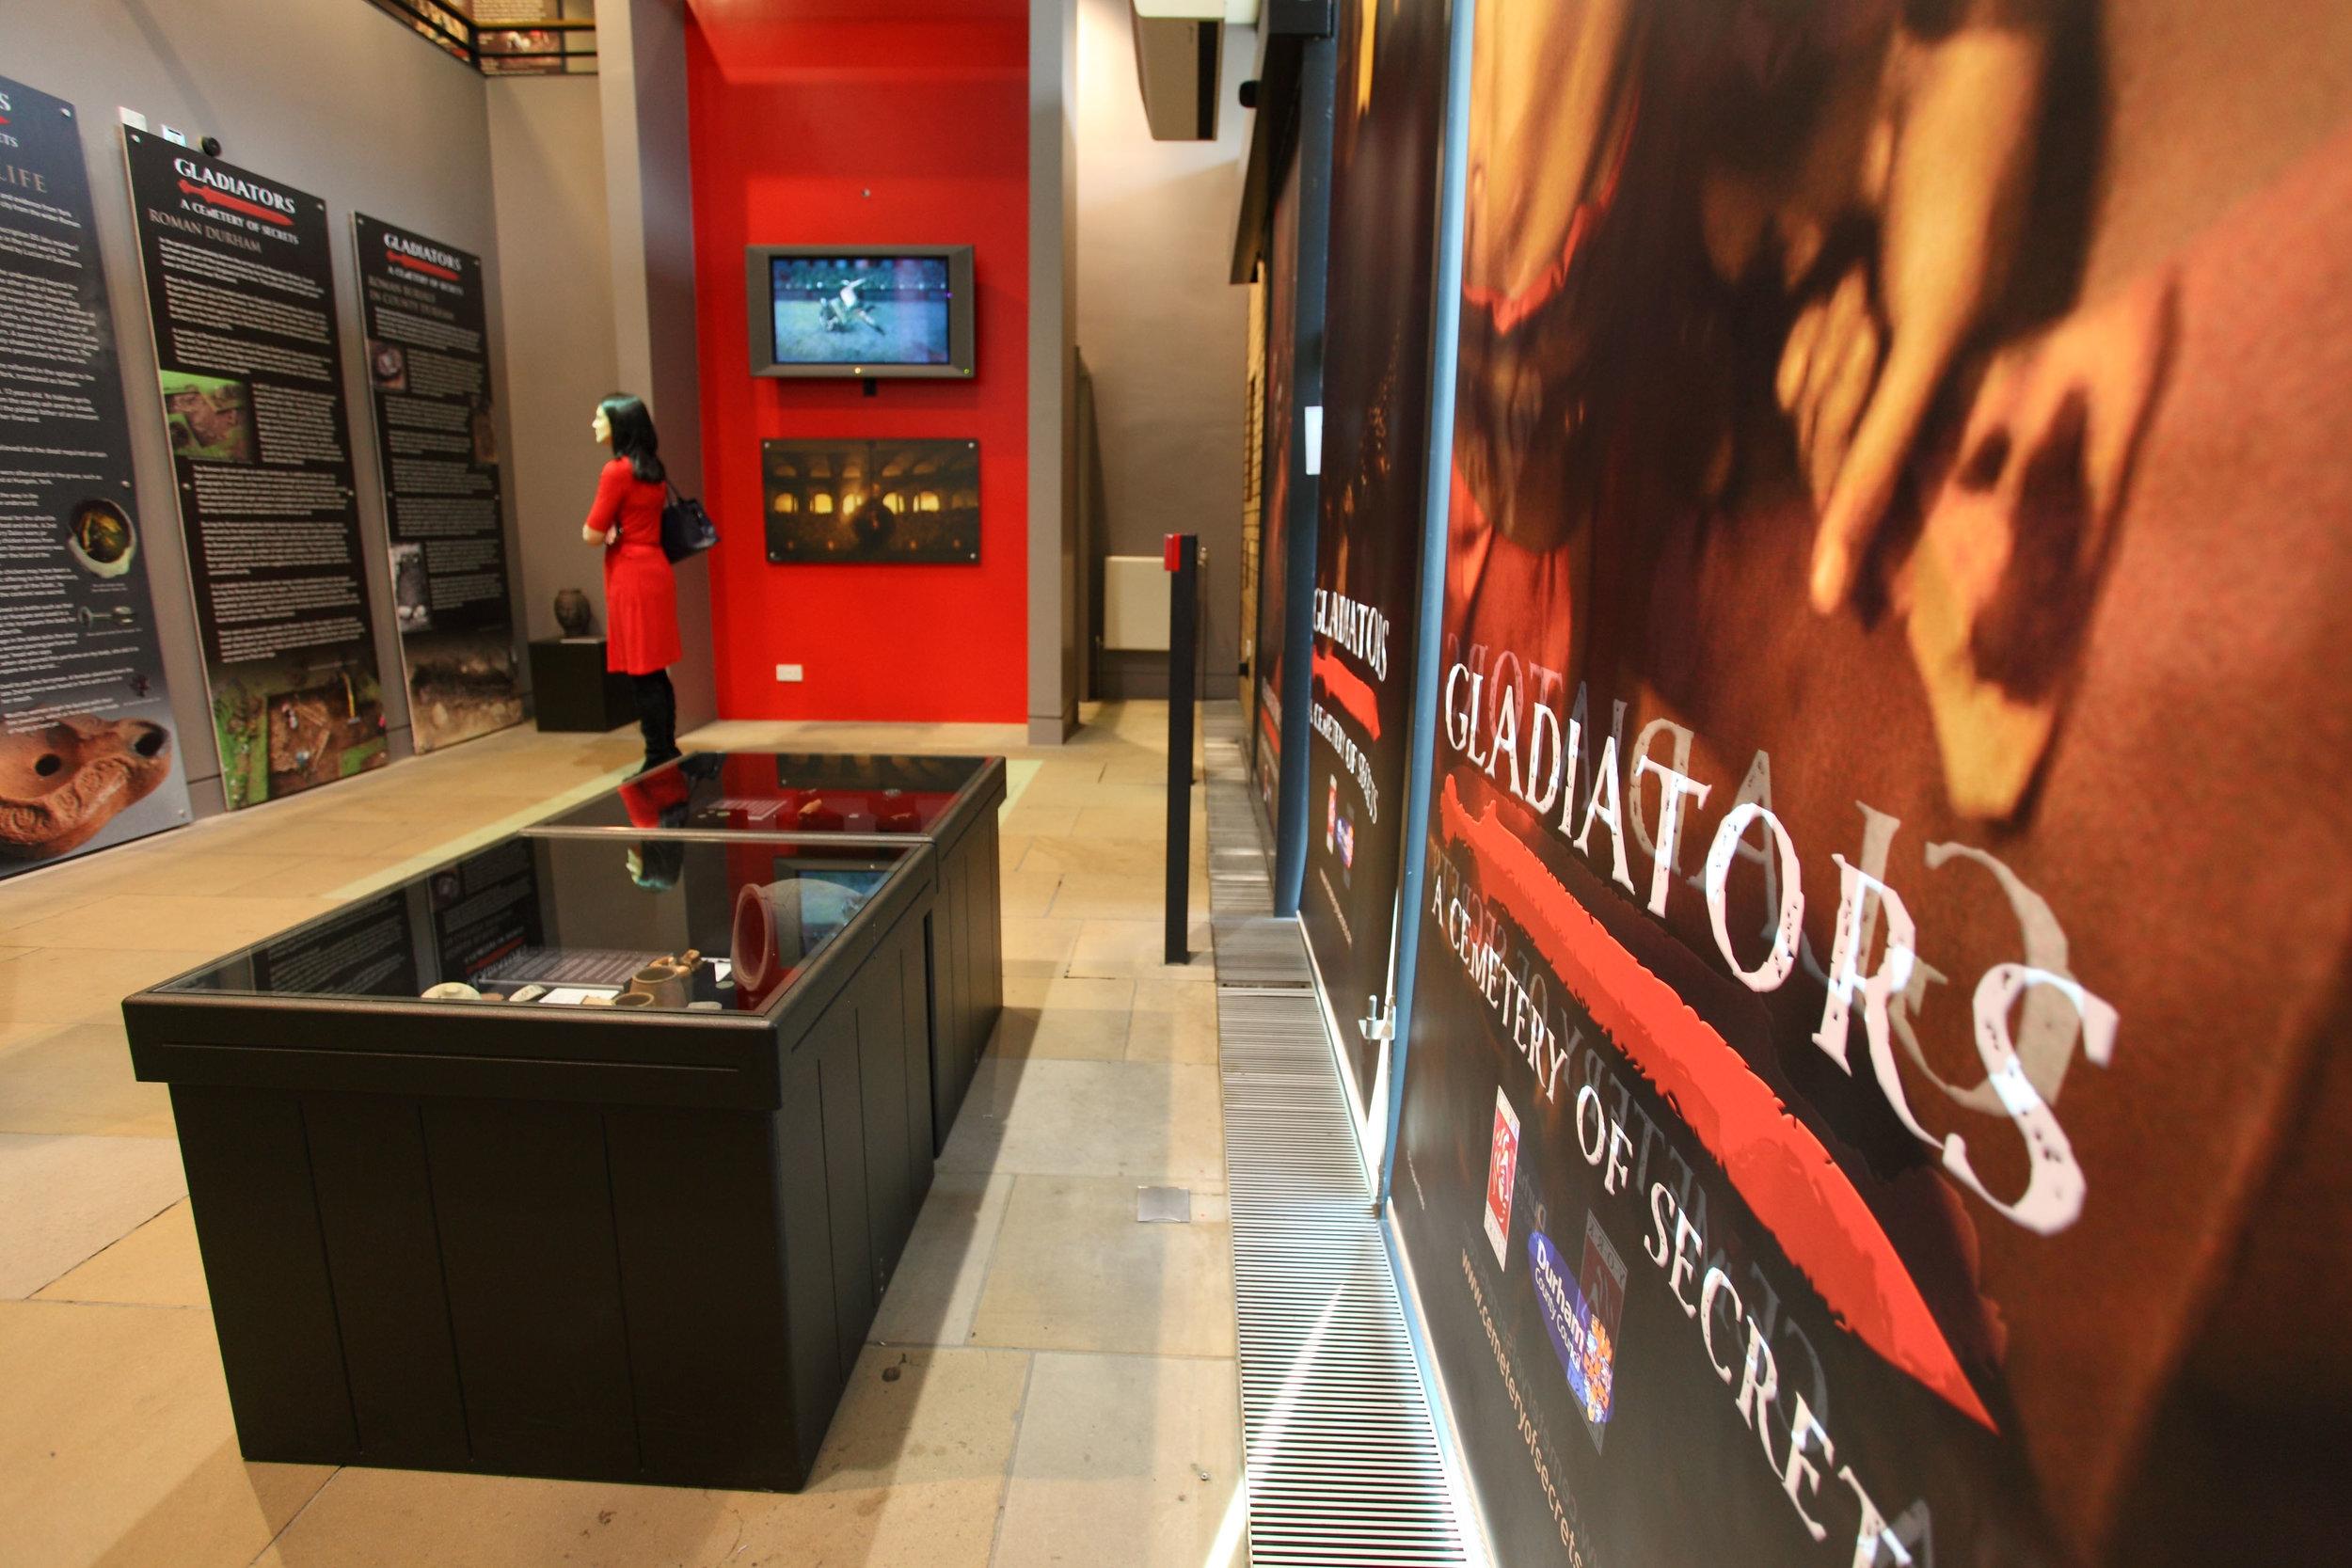 Image shows Gladiators Exhibition in Durham